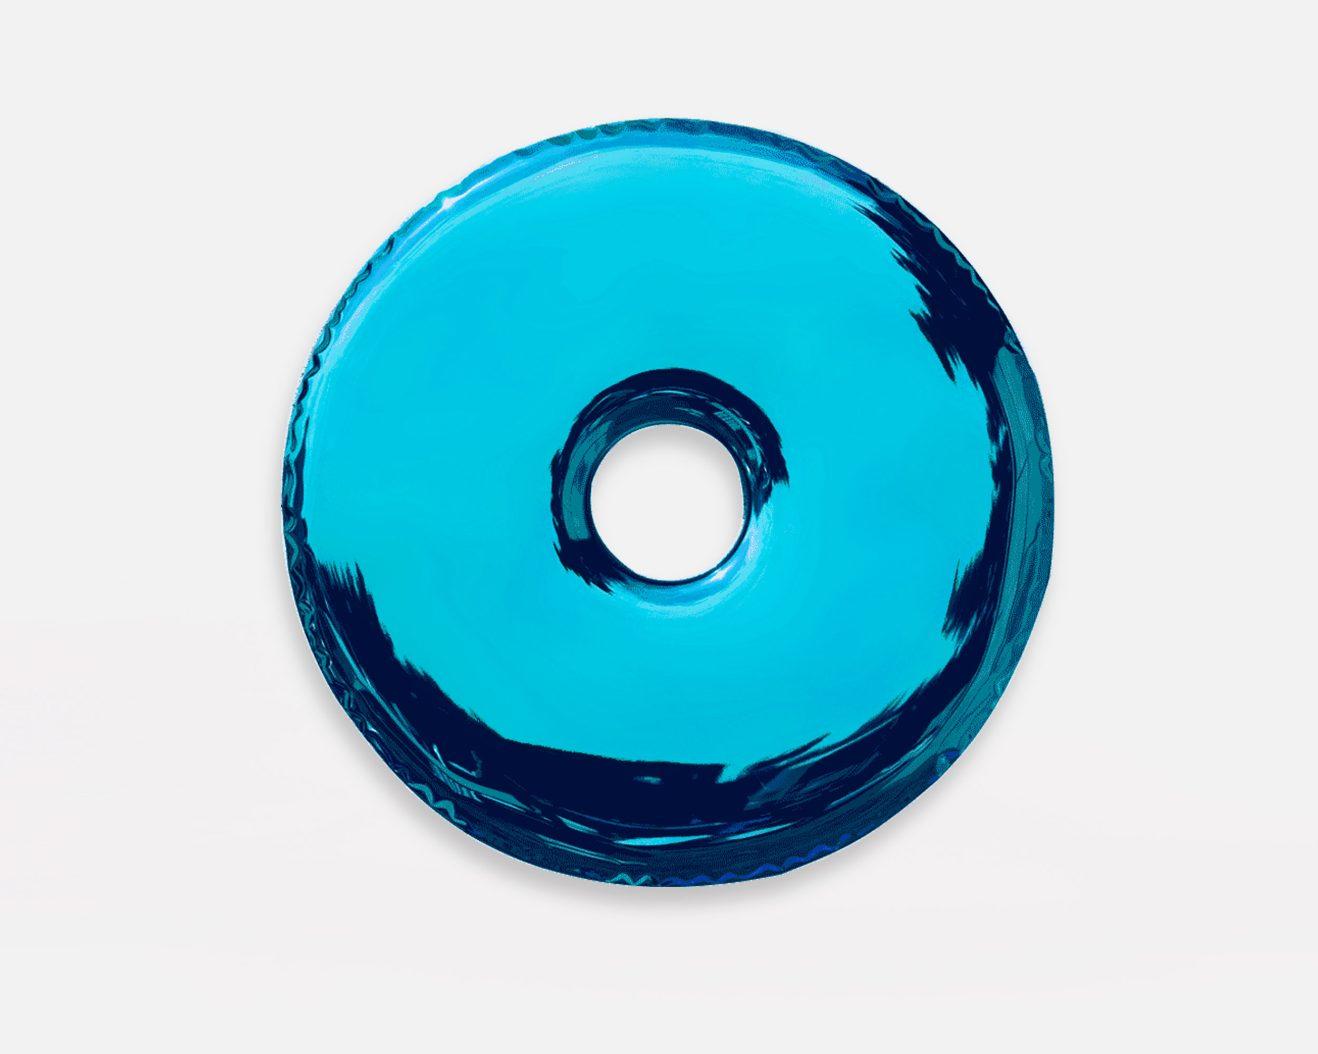 Zieta-Prozessdesign-Rondo-Mirror-Gradiant-Deep-Space-Blue-Savannah-Bay-Gallery